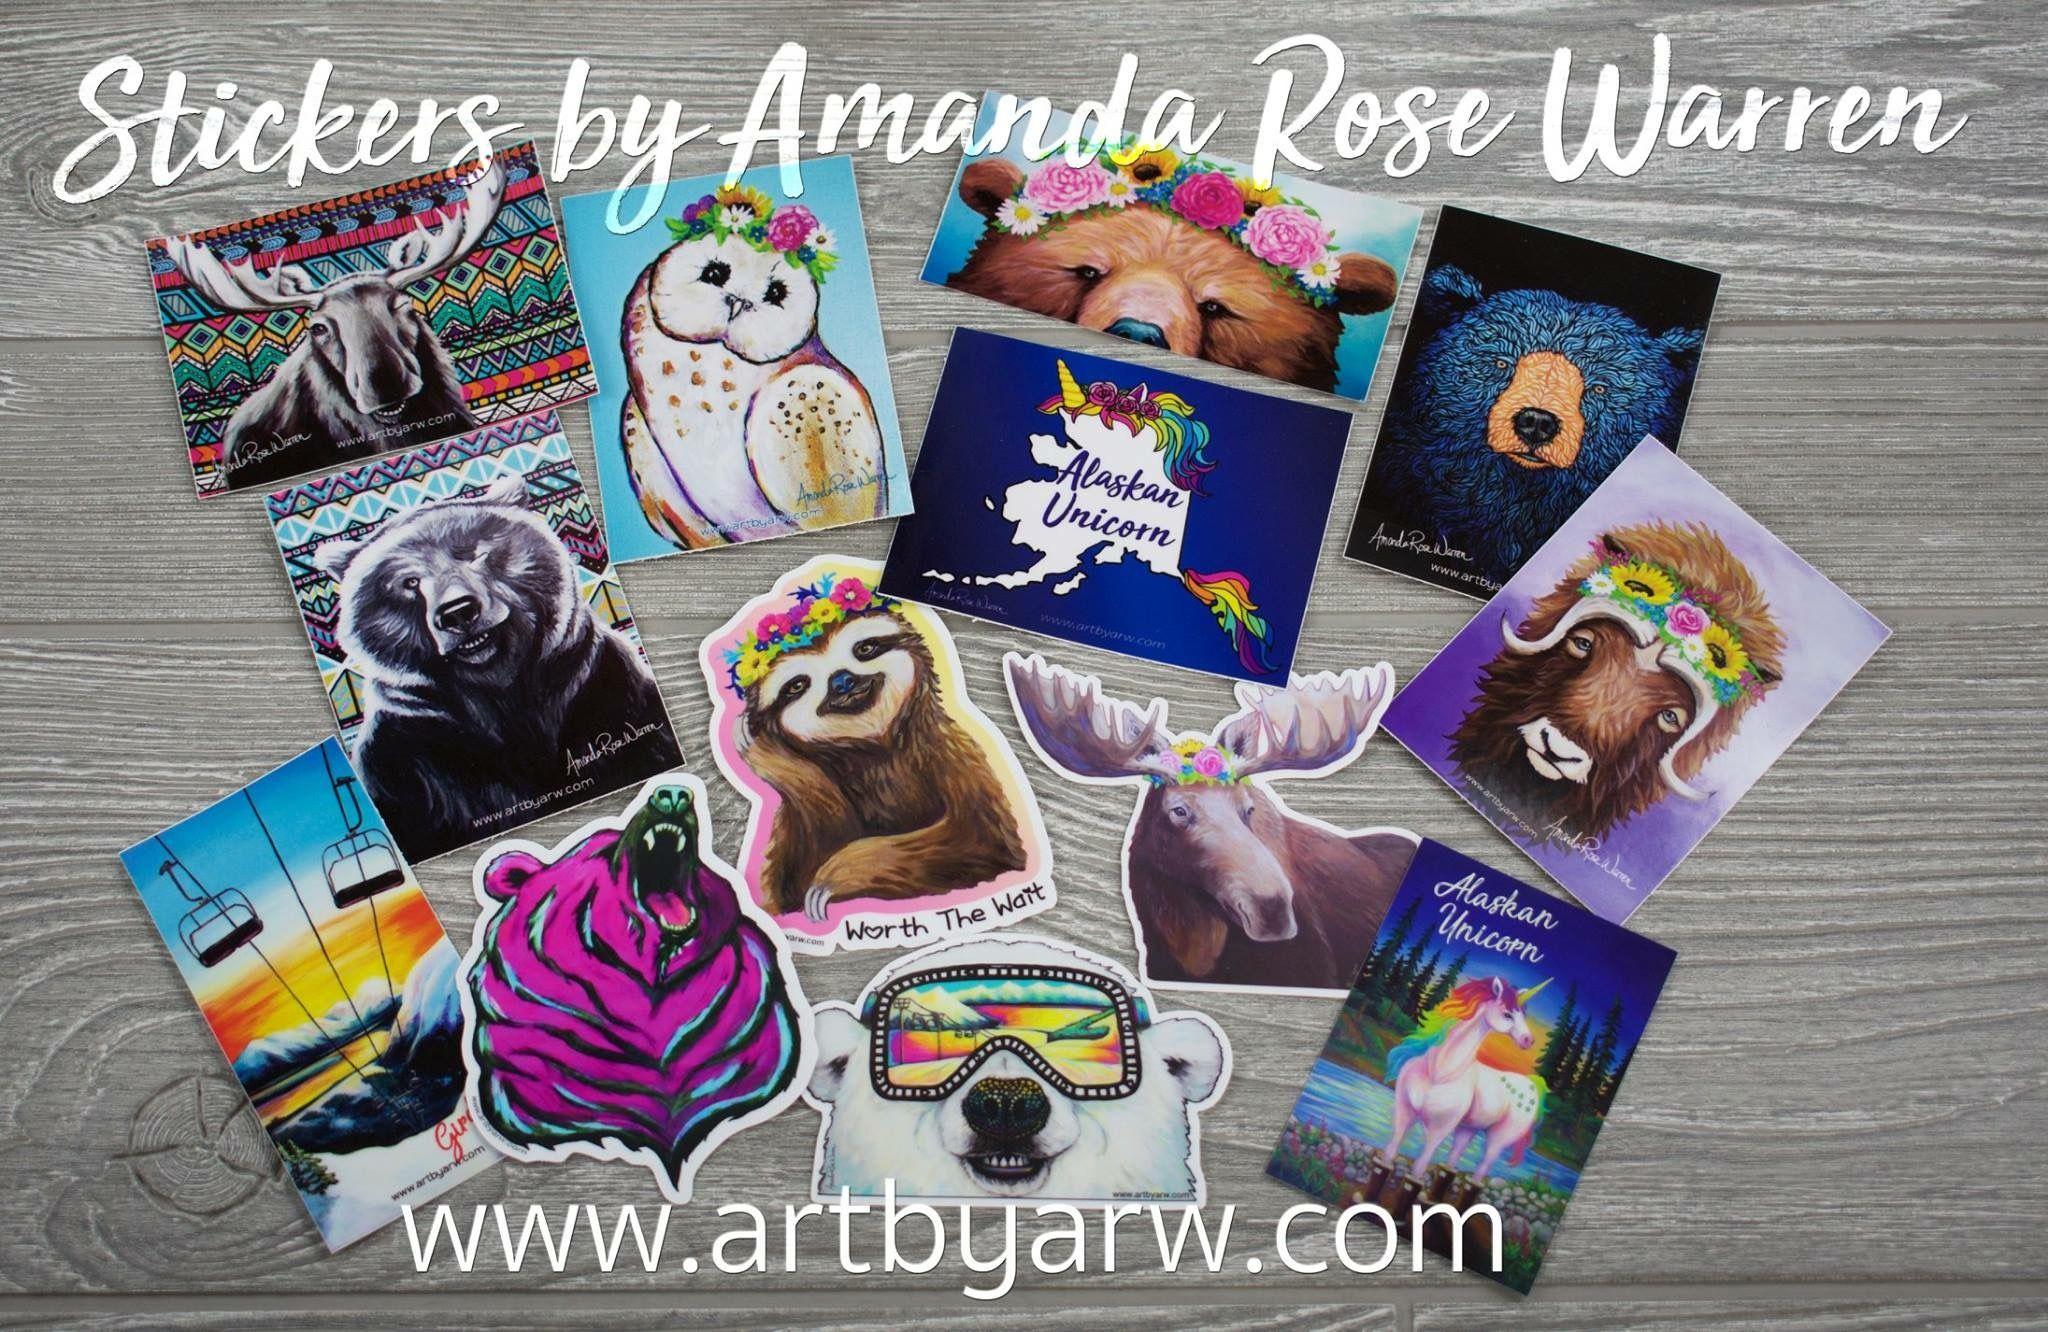 18 Amanda Rose Warren Artwork ideas in 18   online art gallery ...